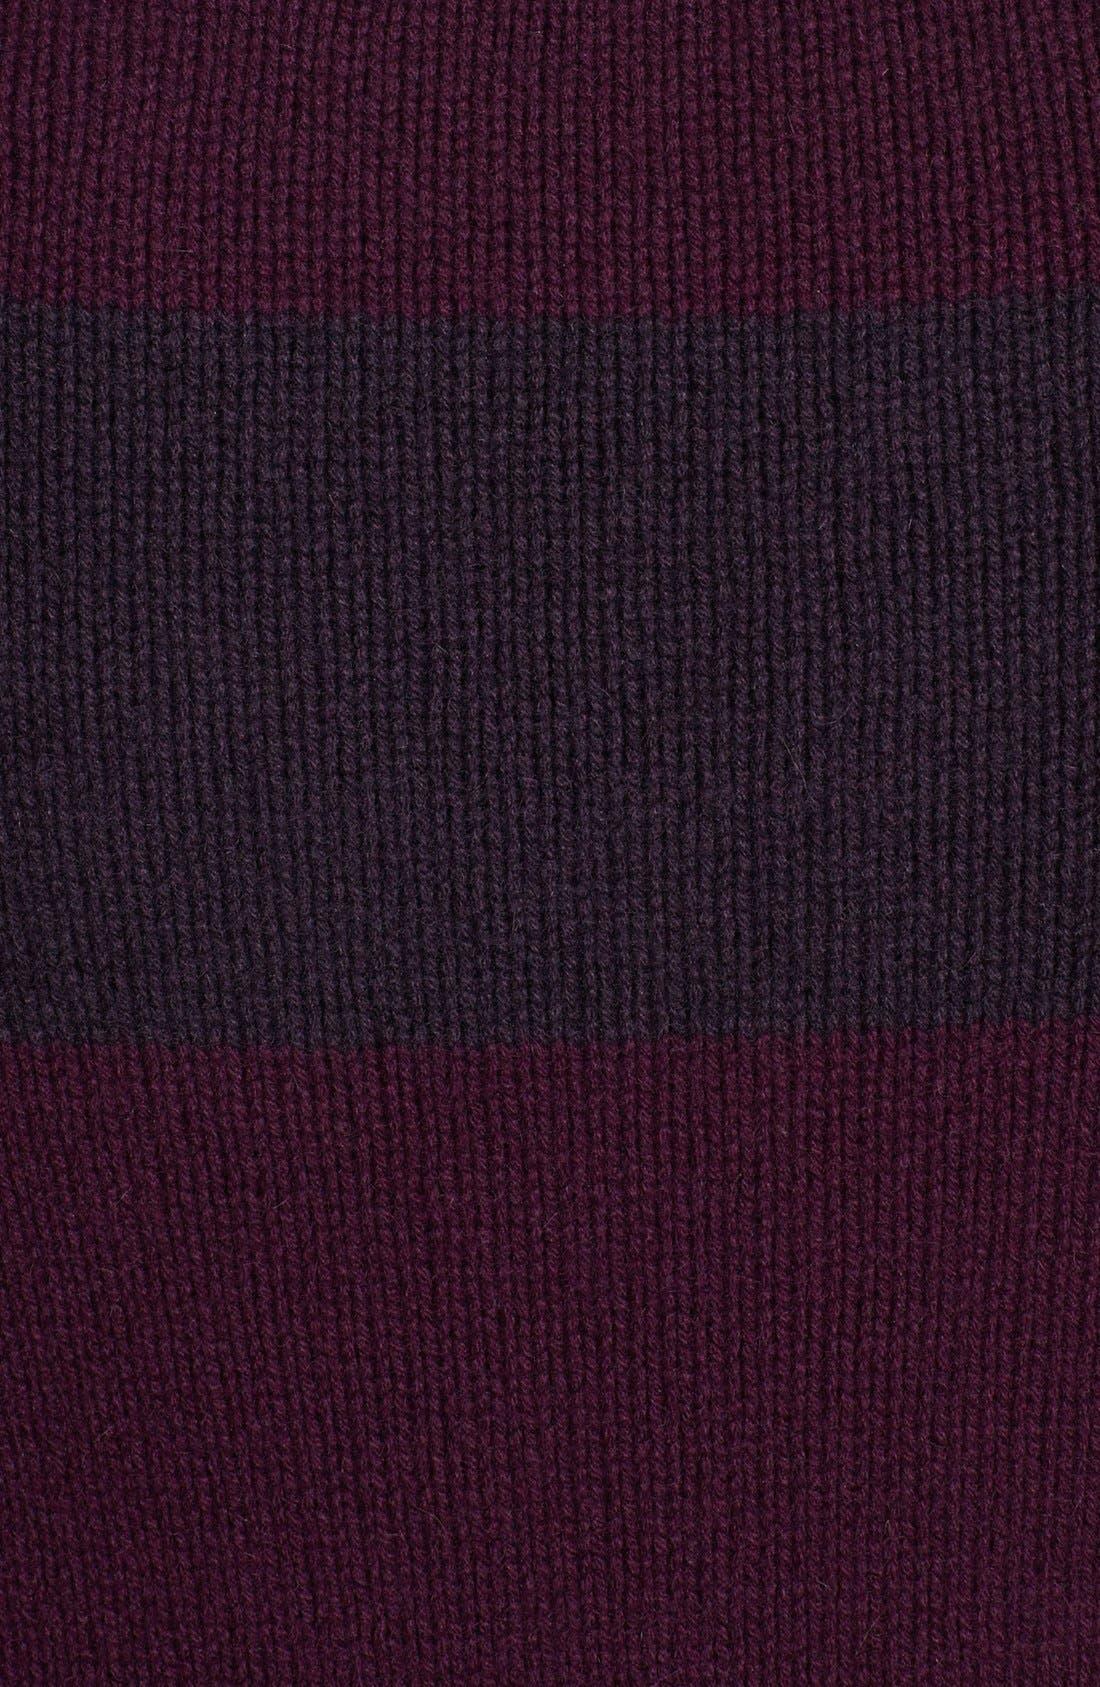 Alternate Image 3  - Vince 'Rugby' Cashmere Crewneck Sweater